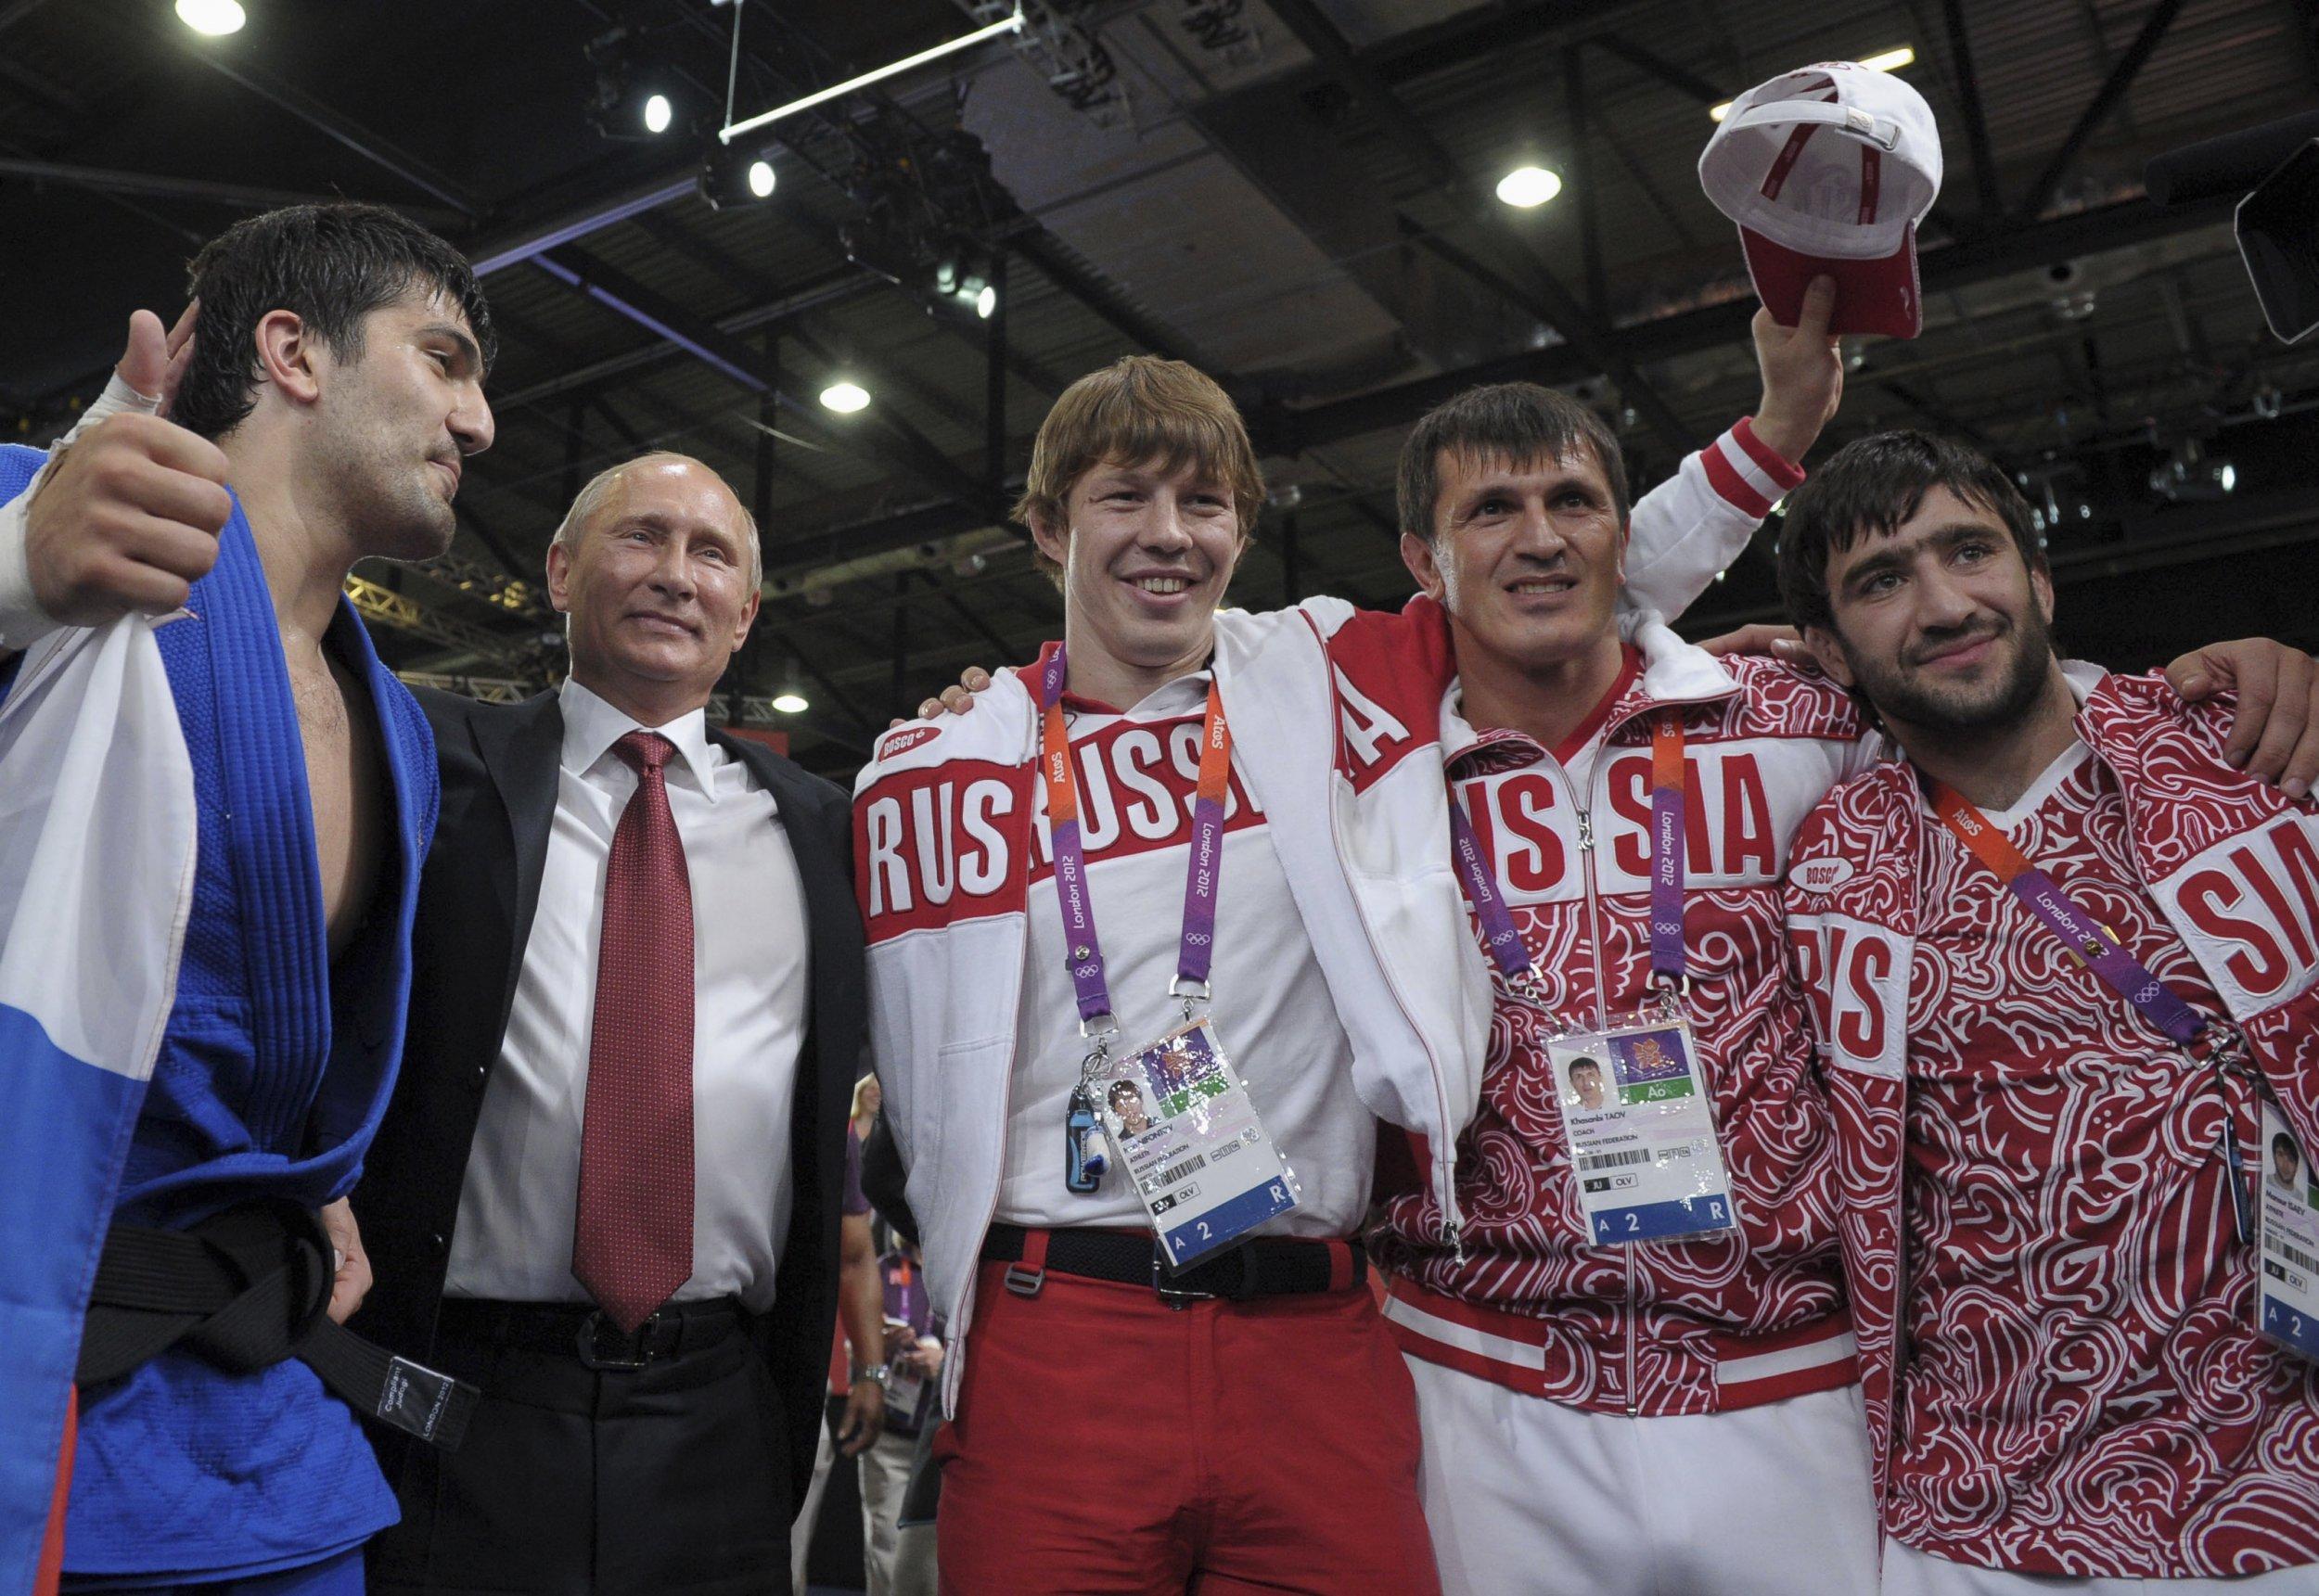 Vladimir Putin at the Olympics